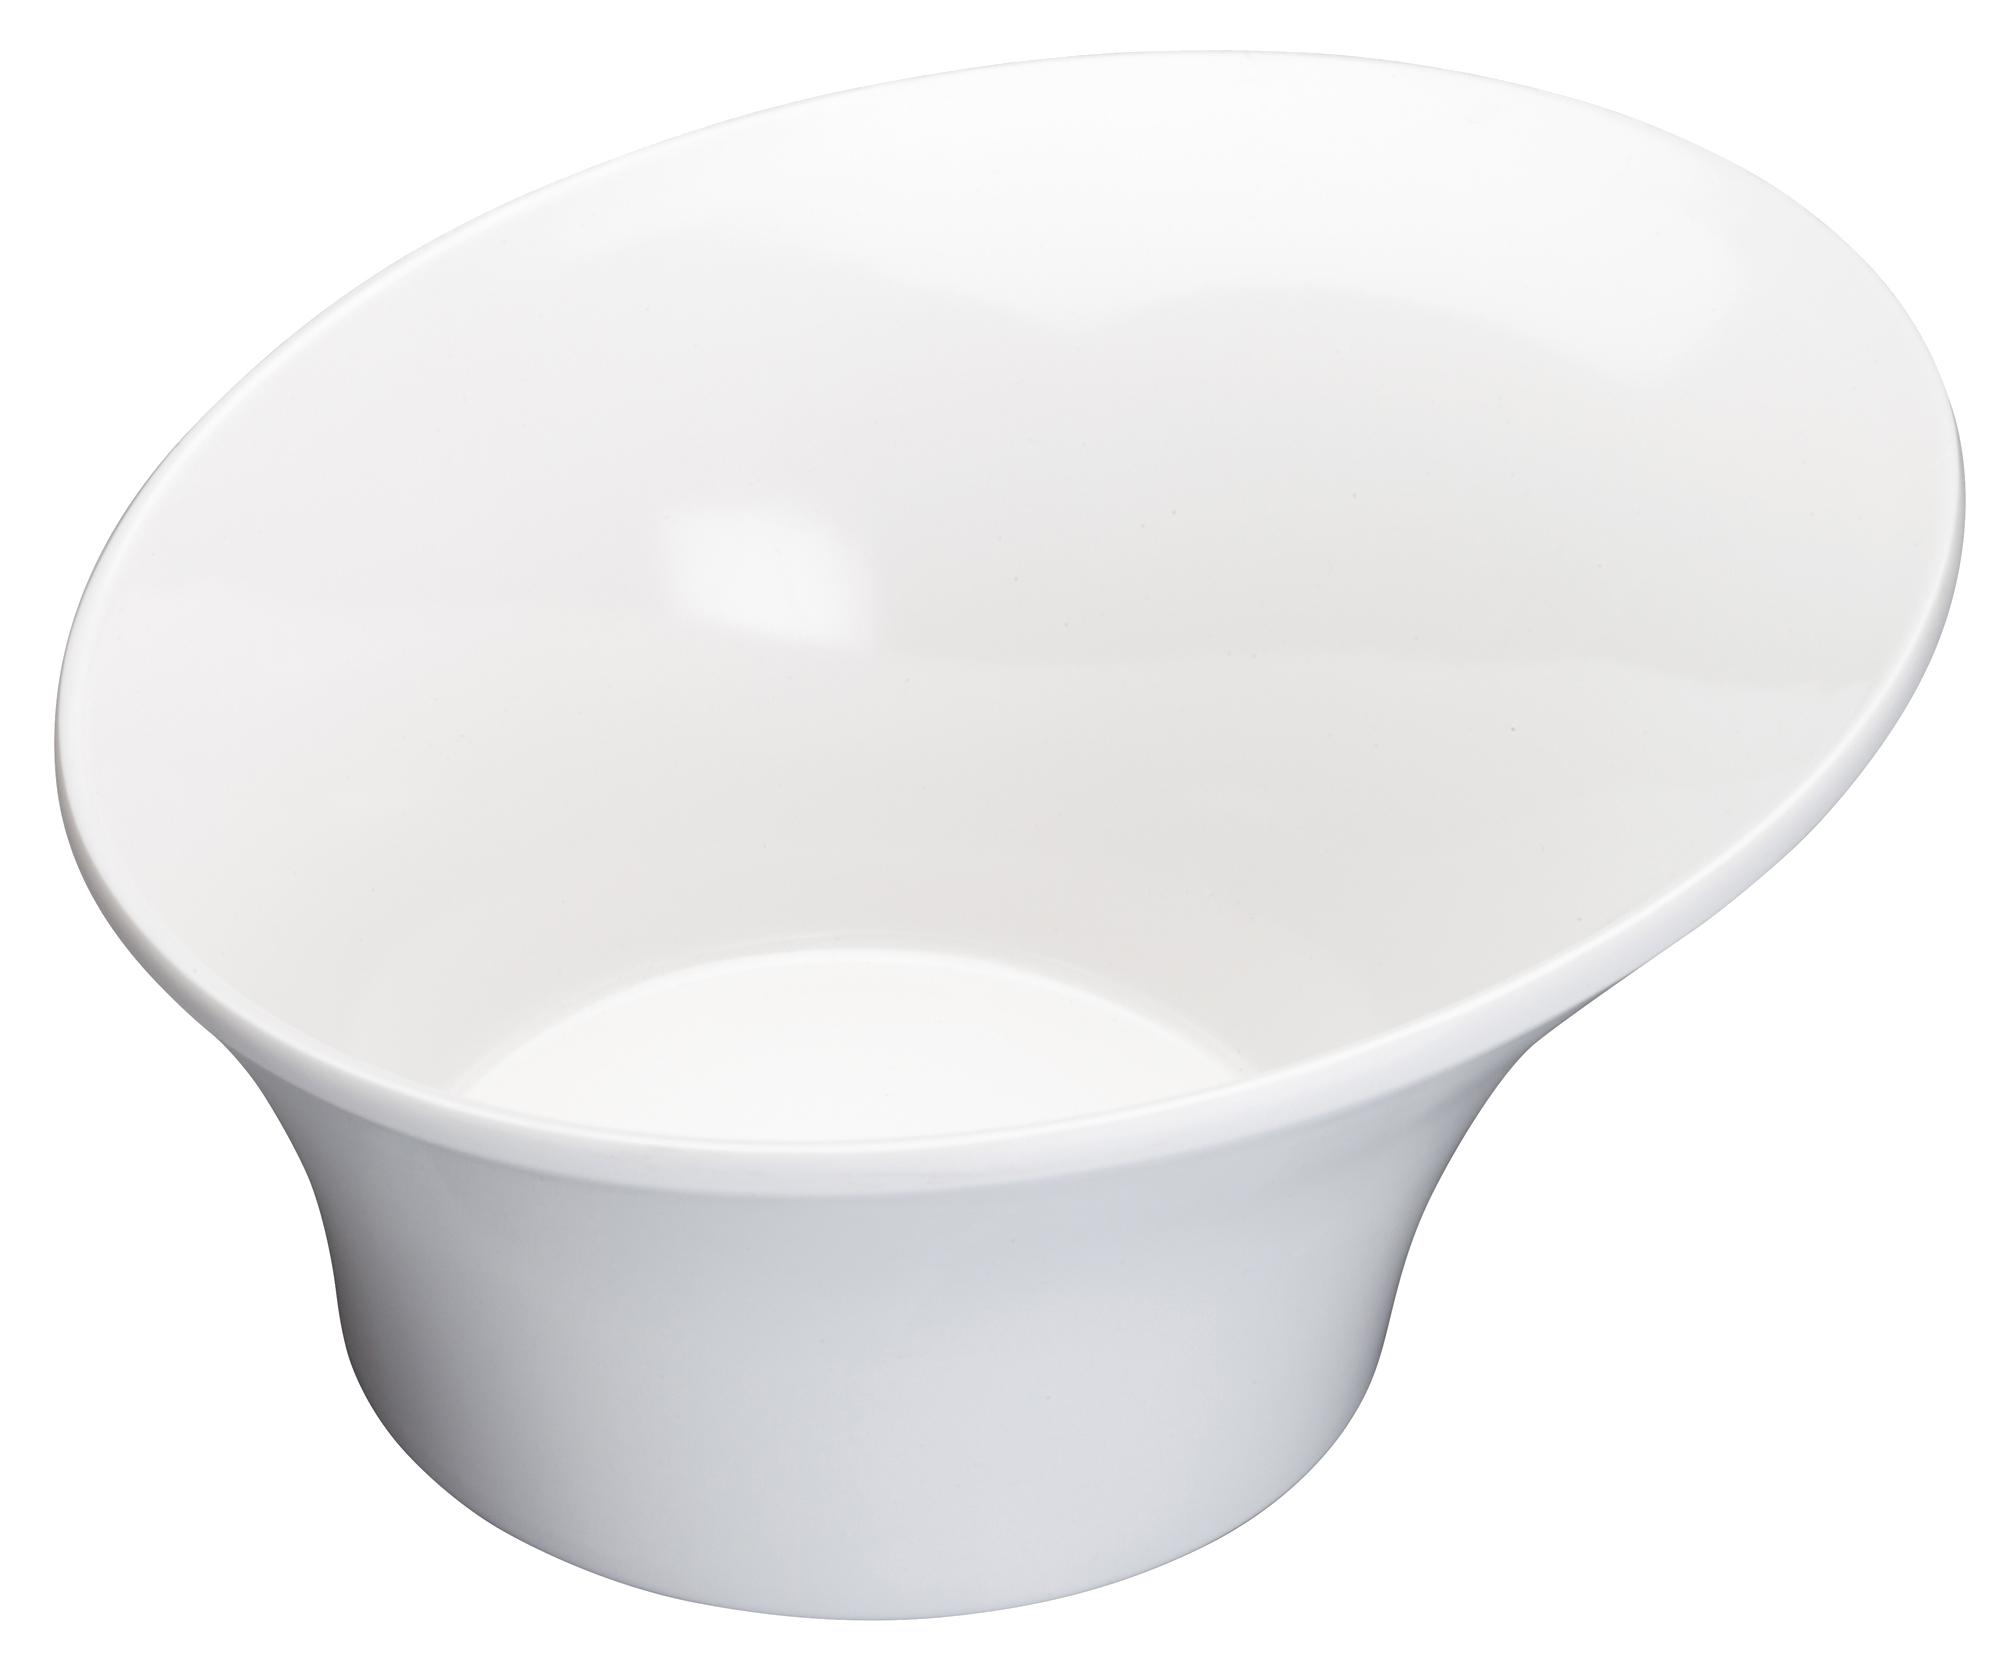 Winco WDM004-203 bowl, plastic,  1 - 2 qt (32 - 95 oz)